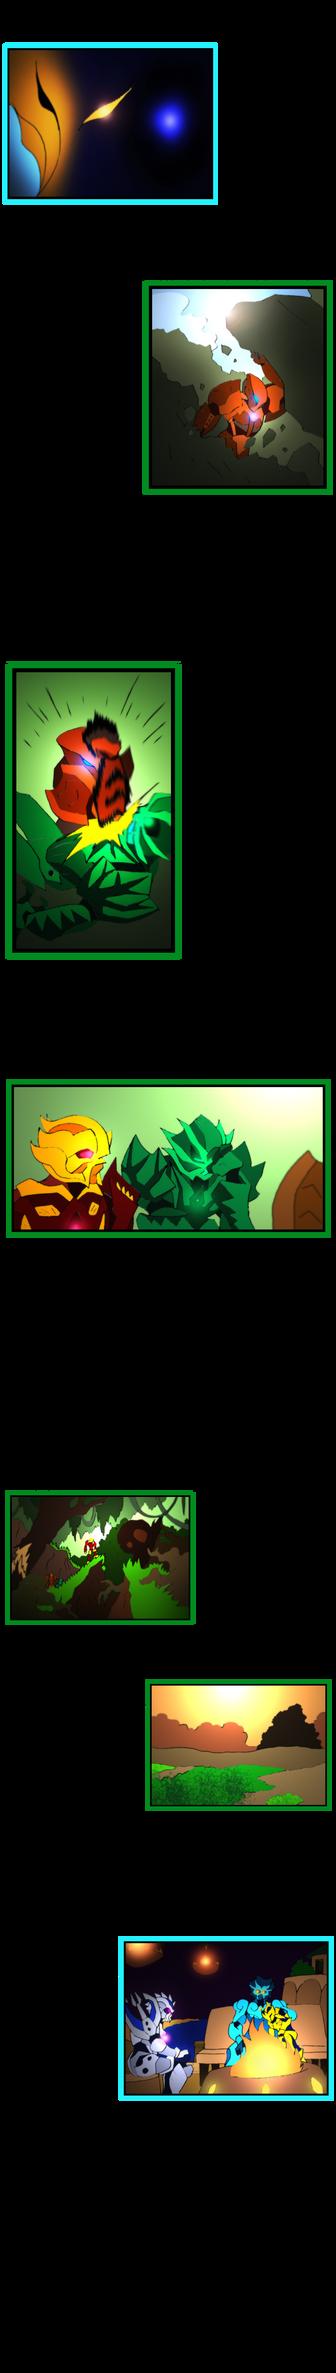 Bionicle- Nova Orbis- Mystery- Chapter 17